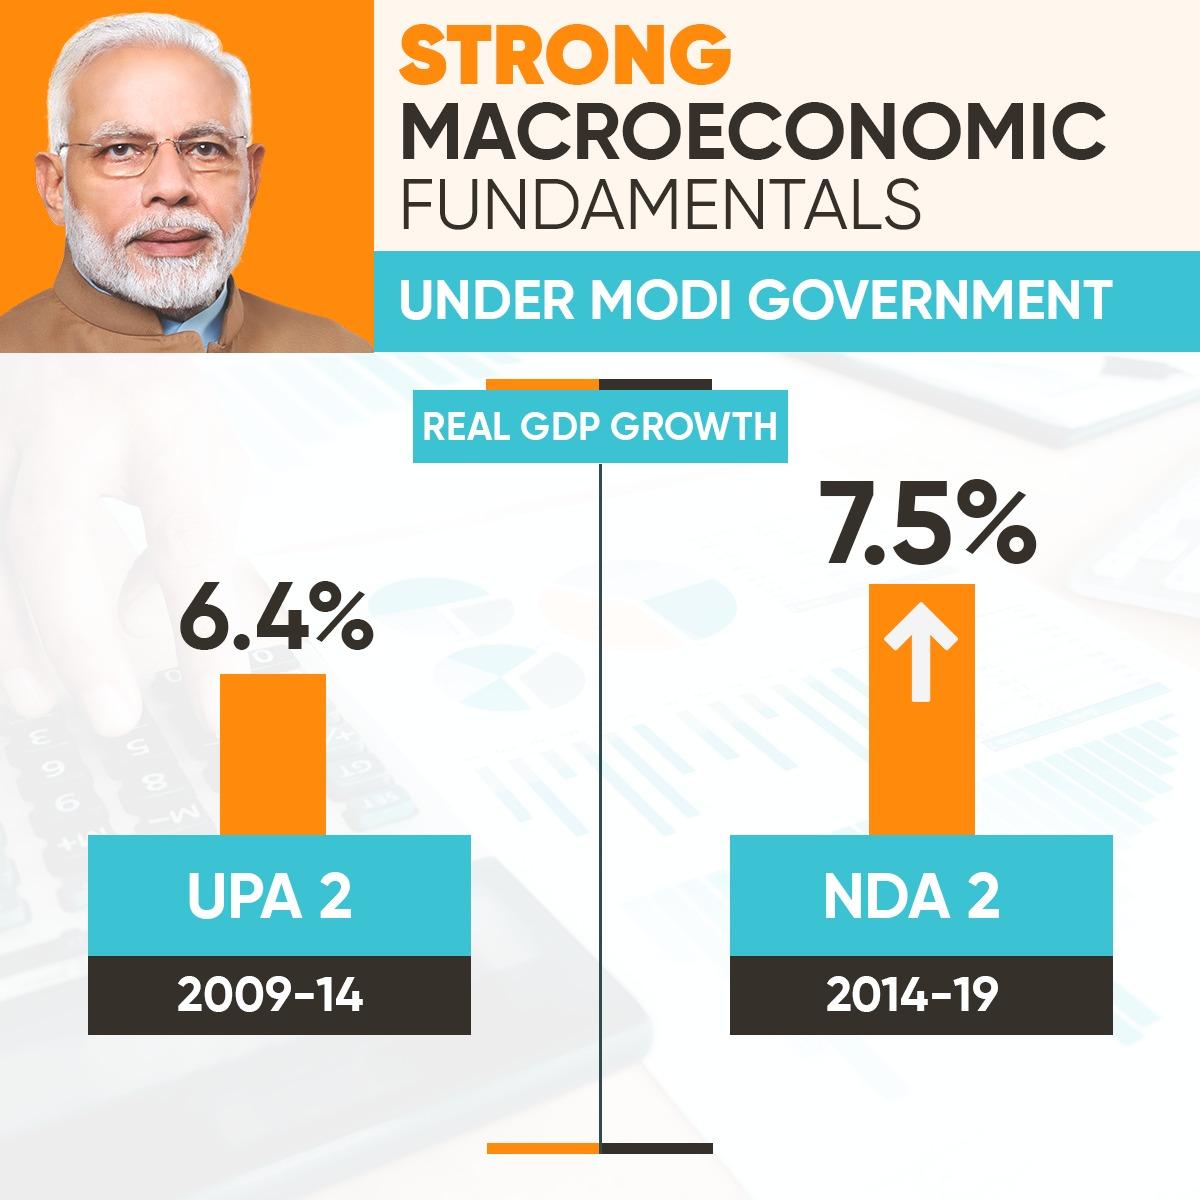 Macroeconomic fundamentals of India are strong under the Narendra Modi led NDA government.